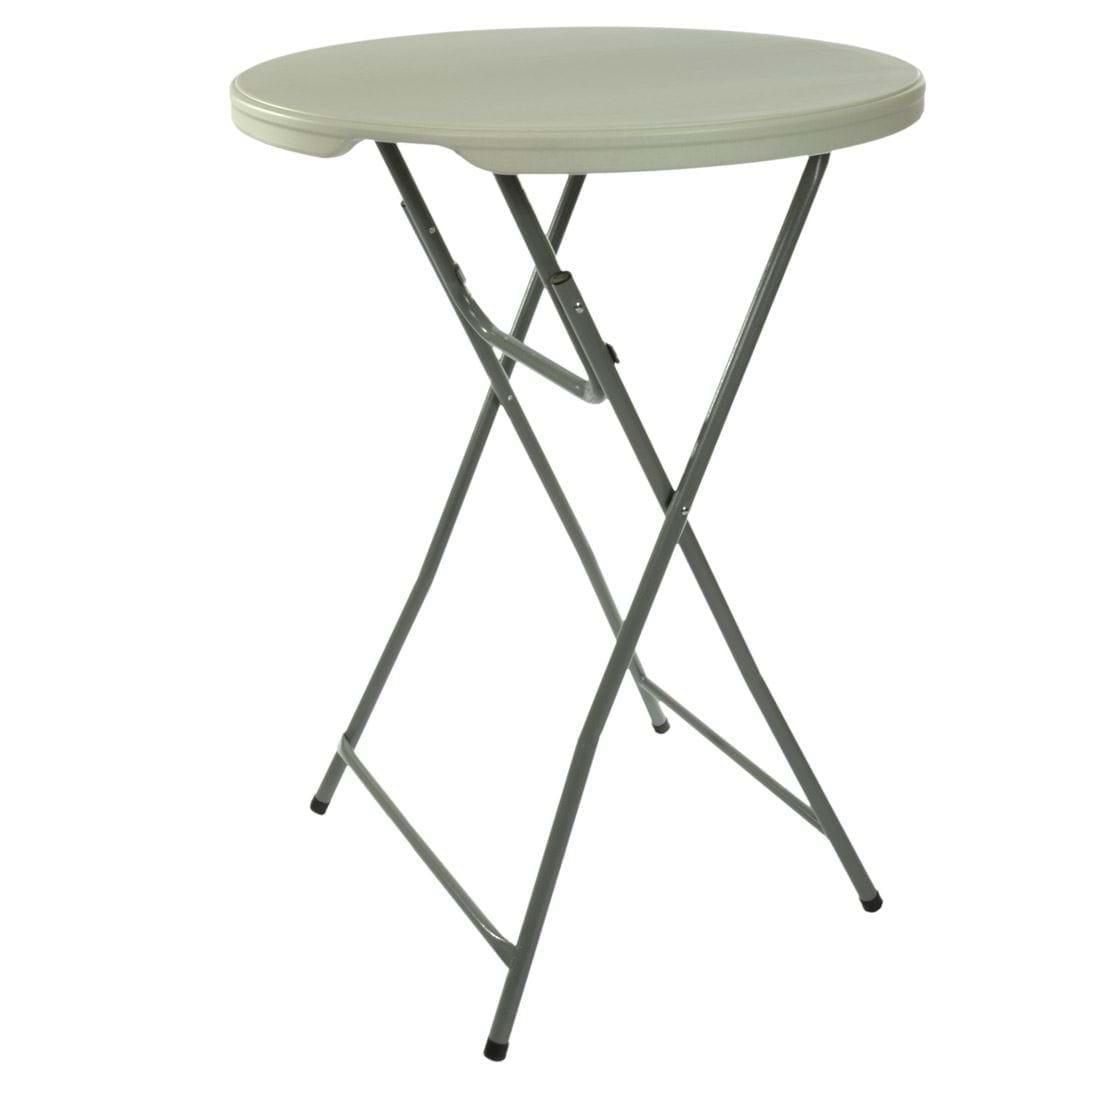 Bar-Height Folding Tables